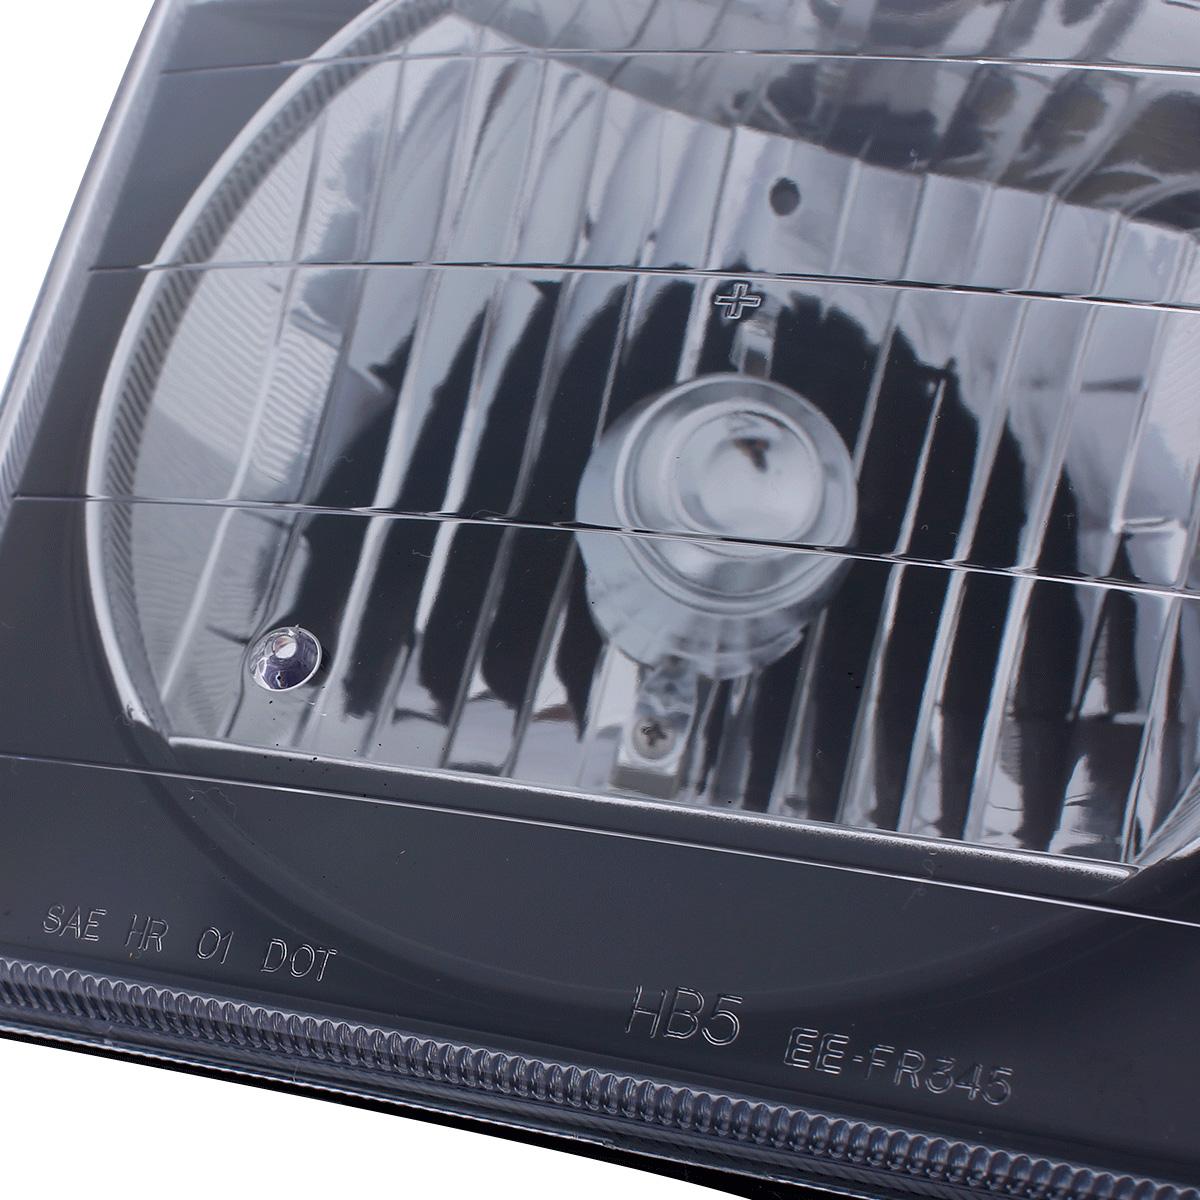 1992 Club Car Wiring Diagram Together With Ford F 150 Wiring Diagram